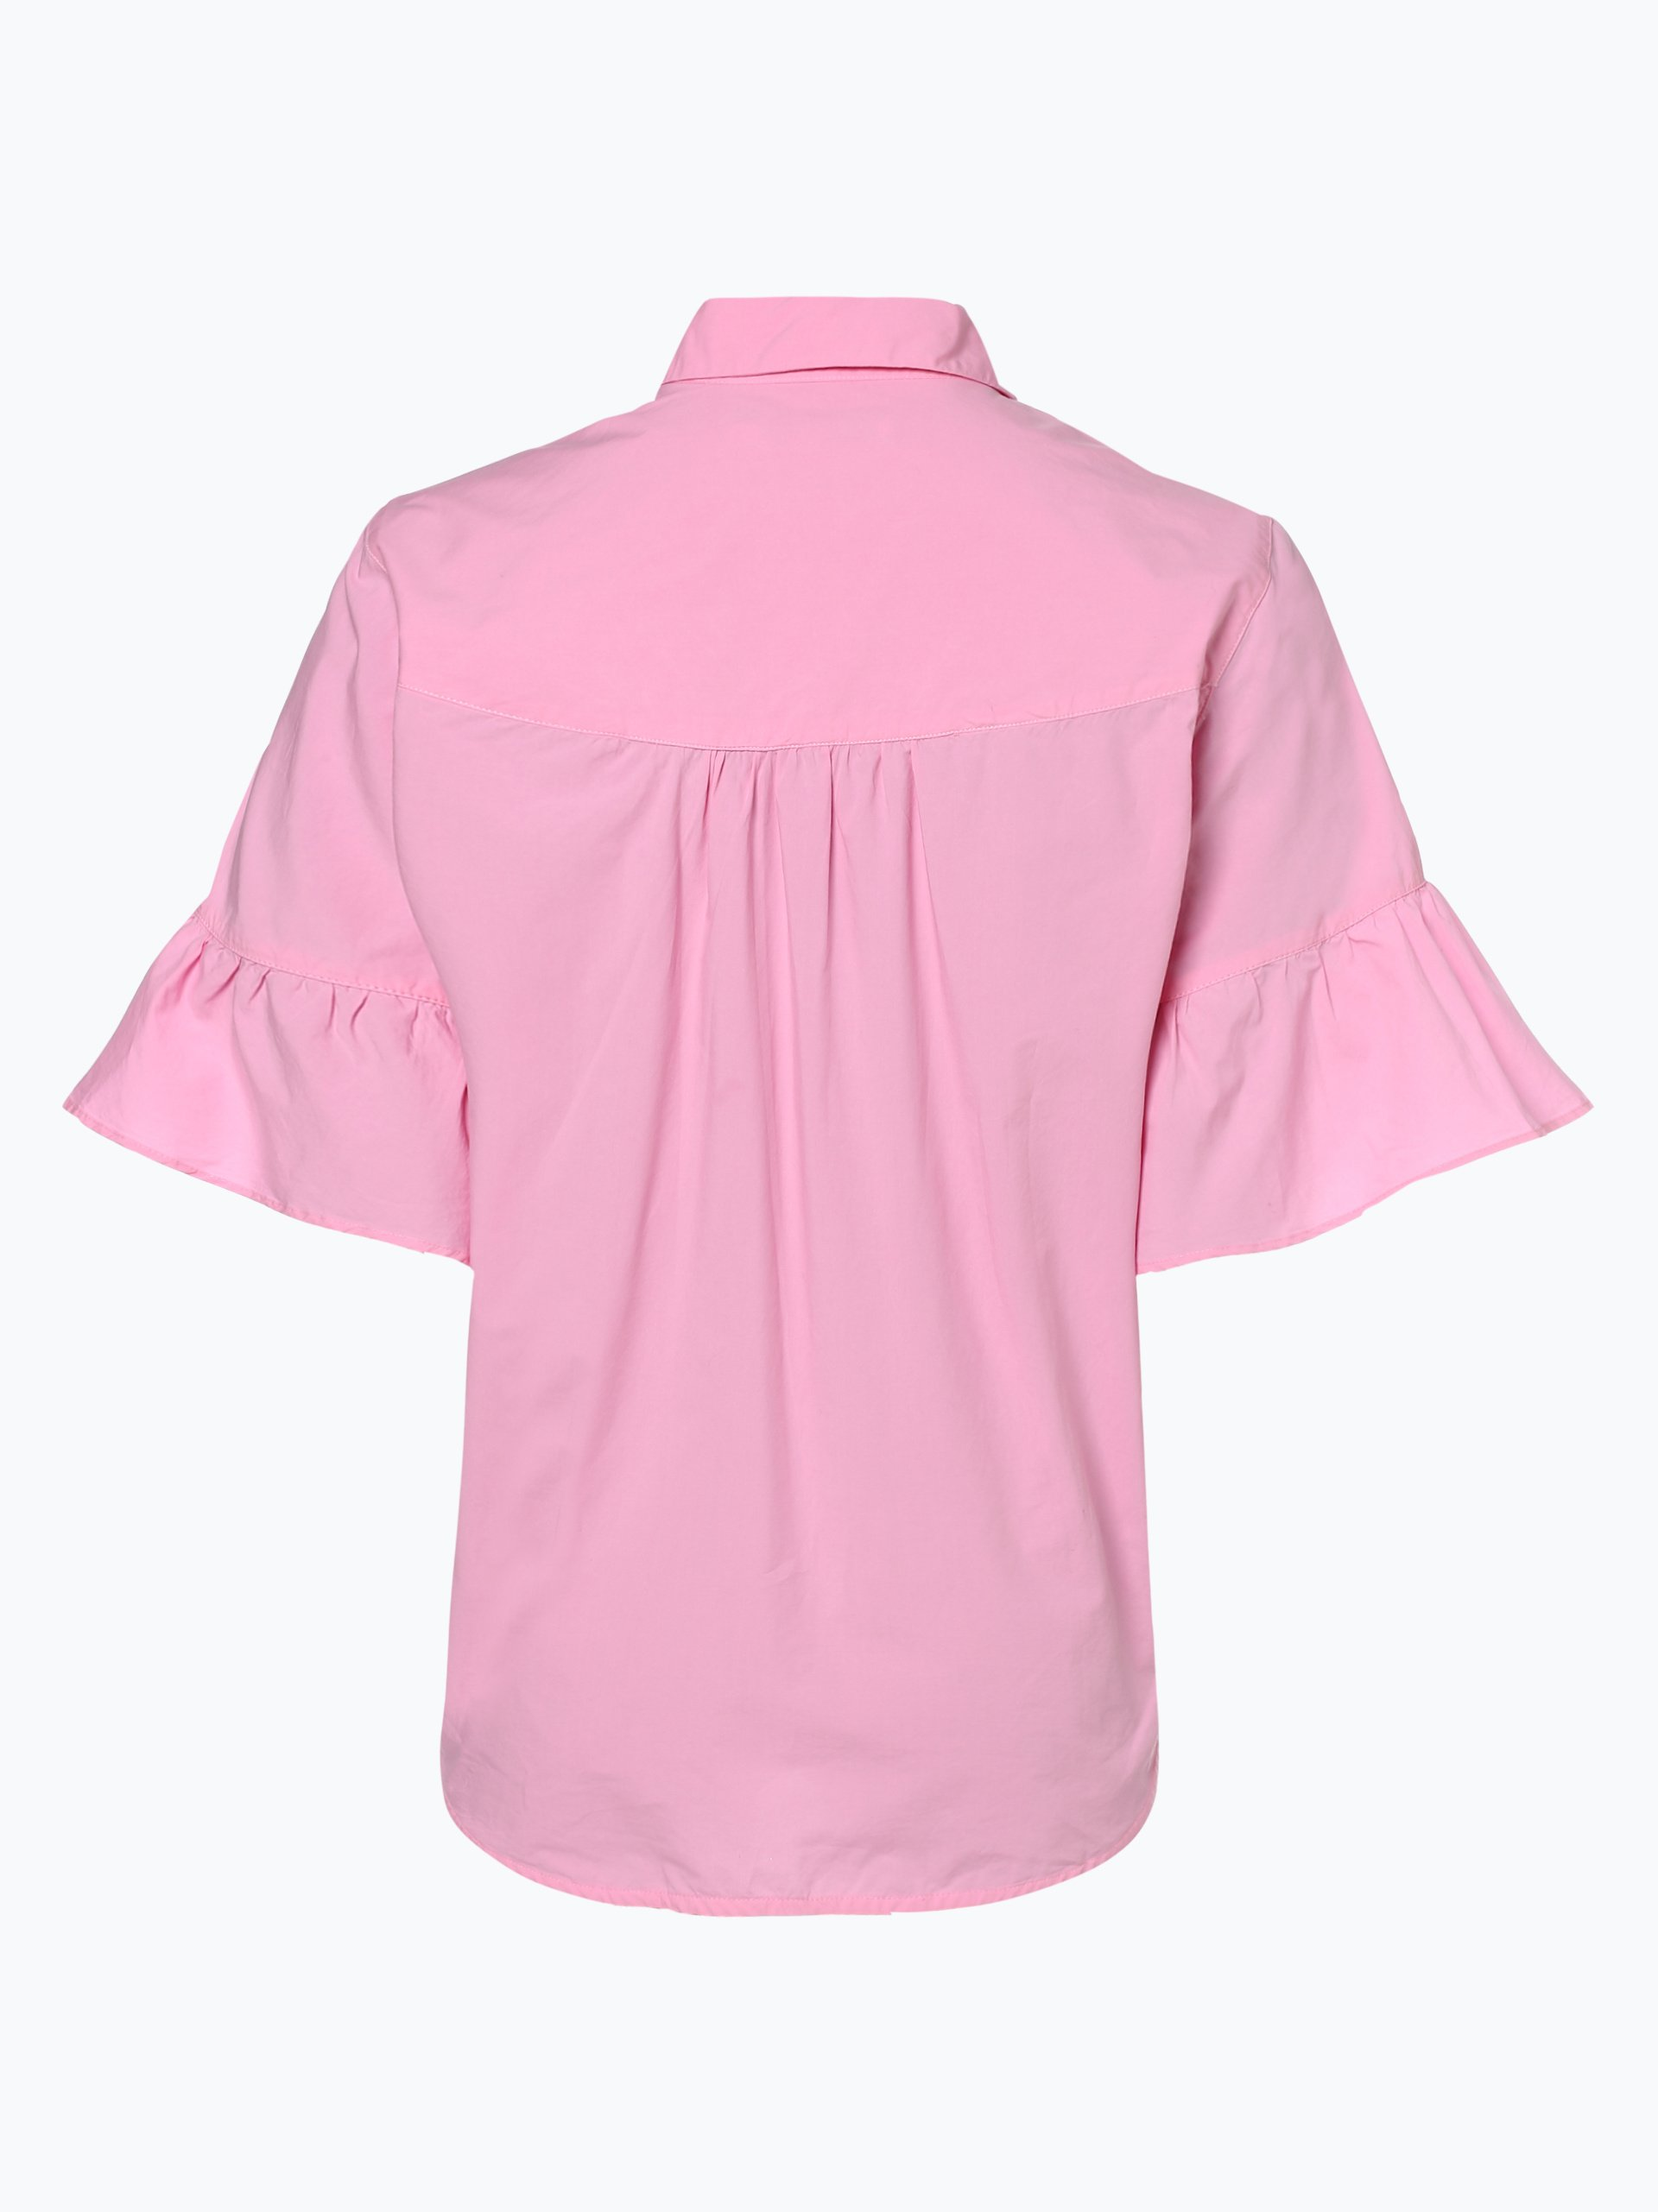 0039 Italy Damen Bluse